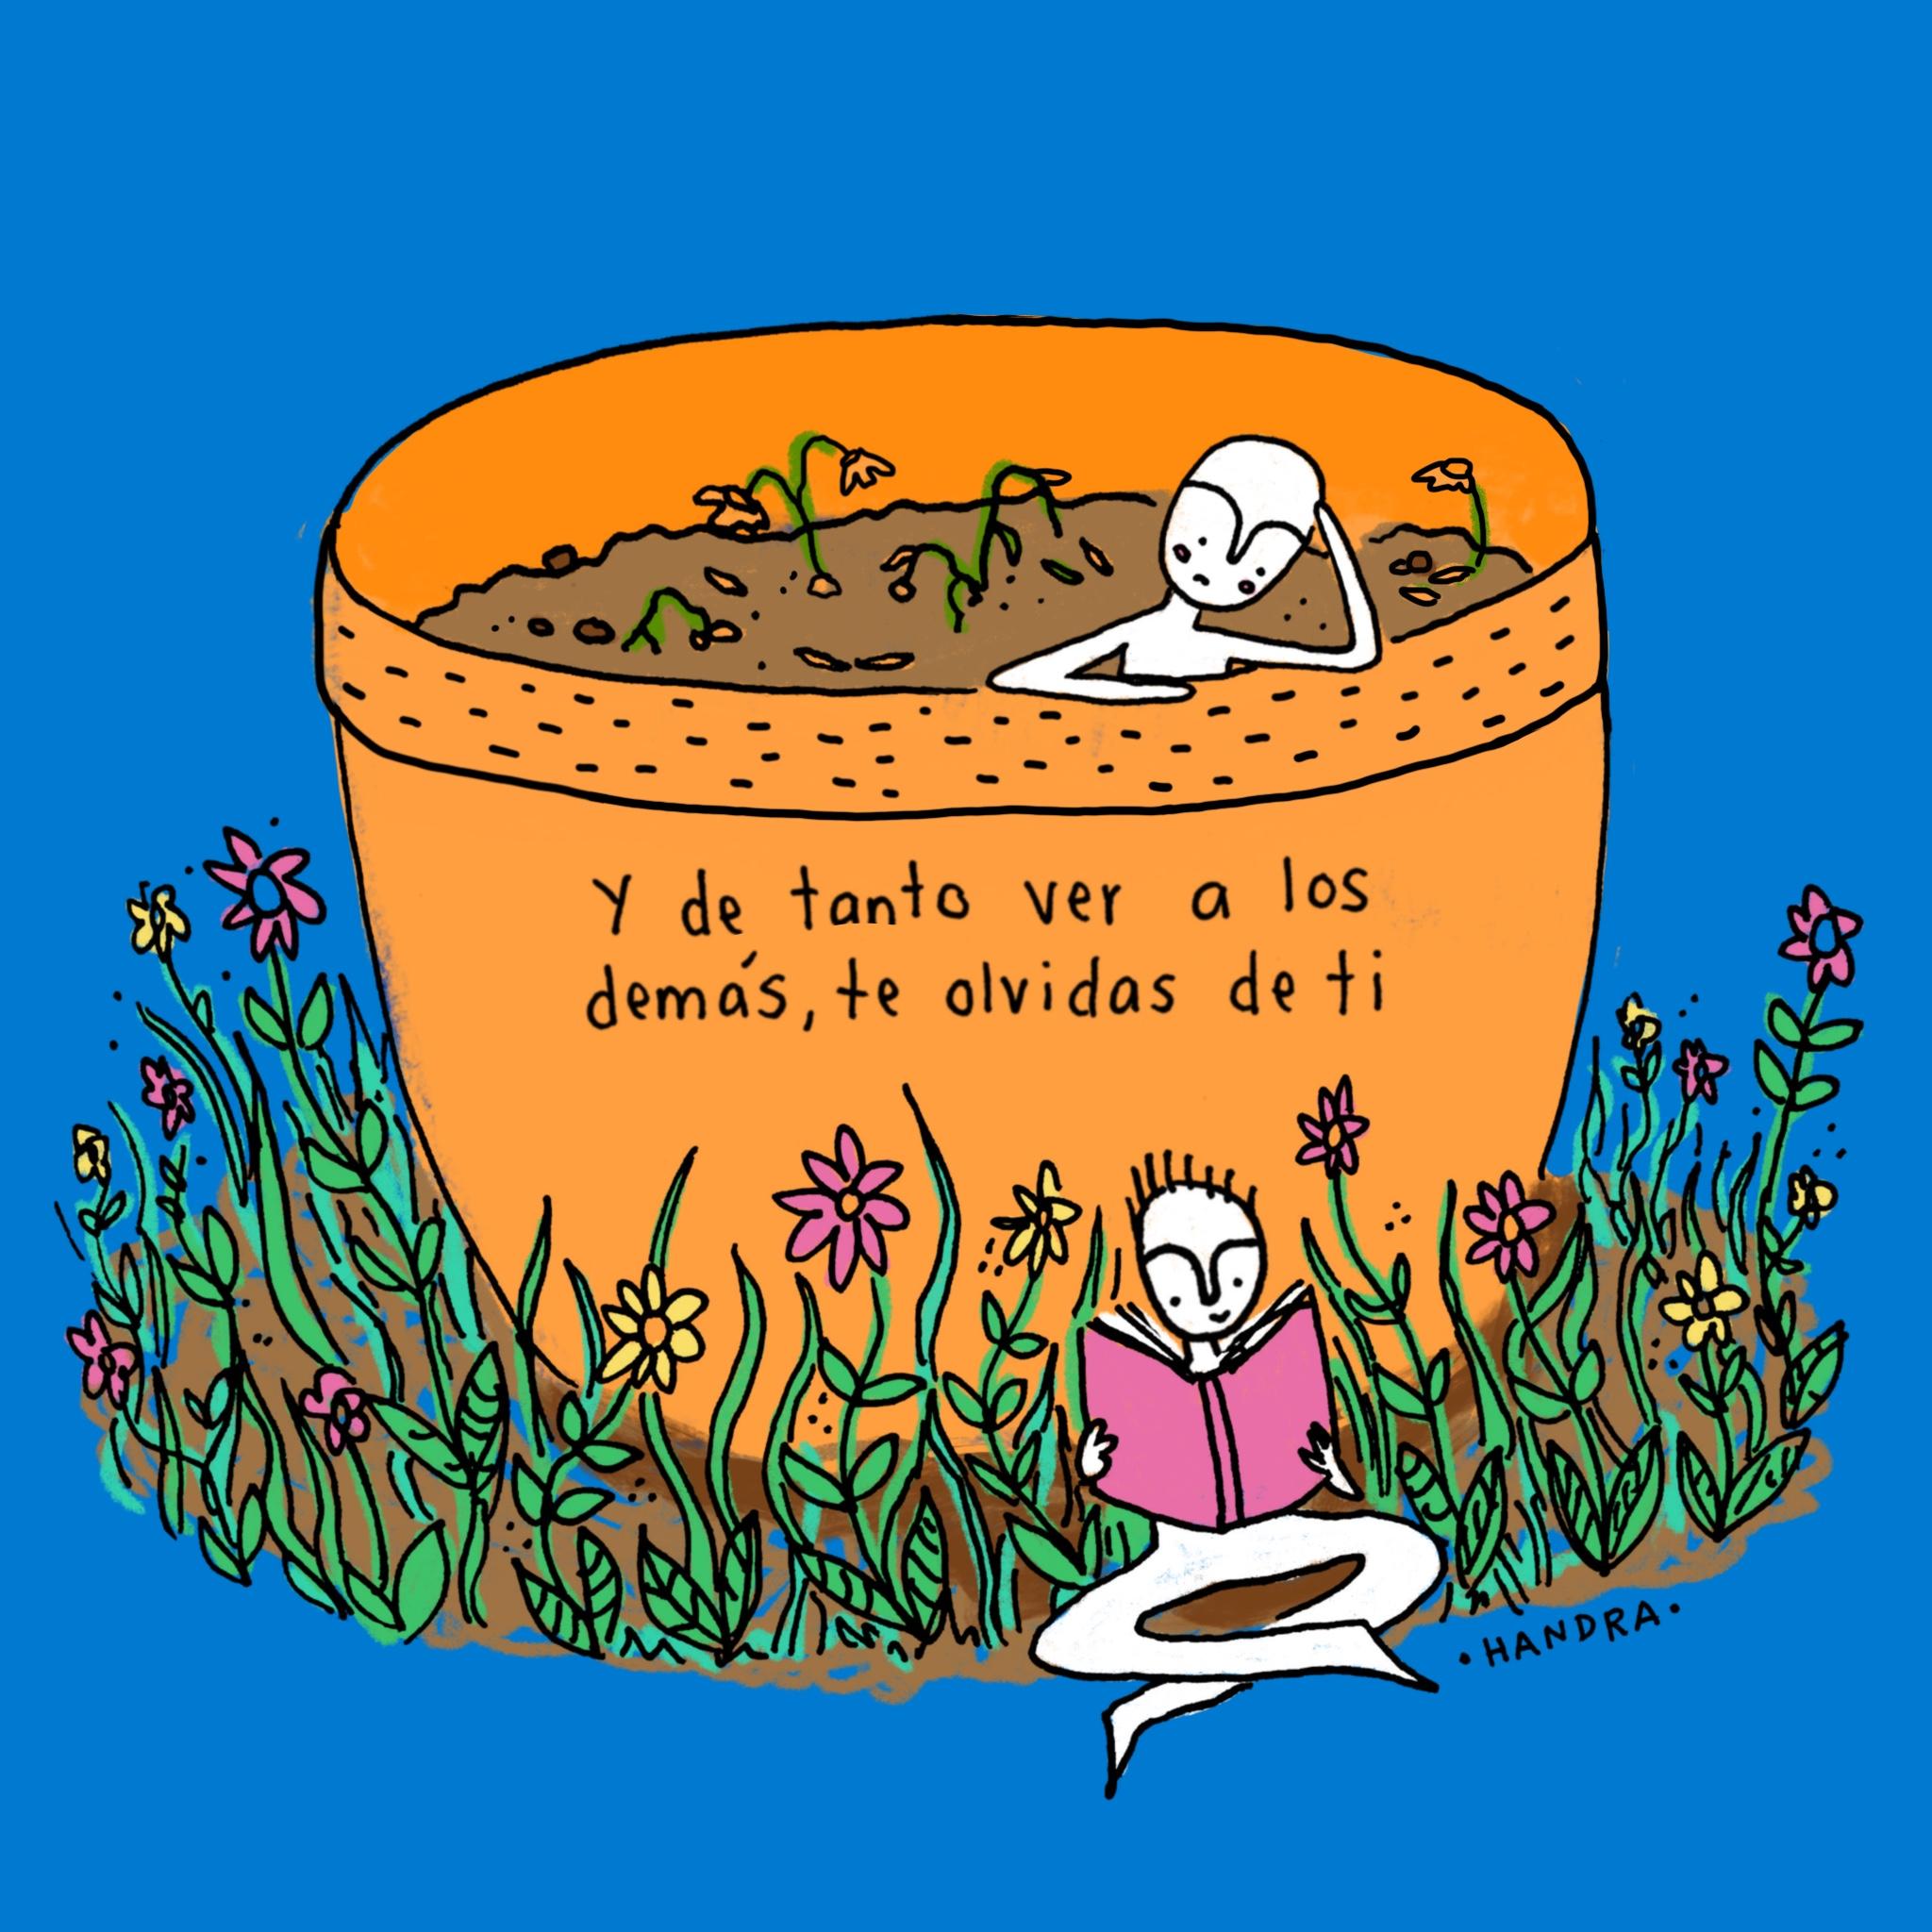 happyhandra_illustration